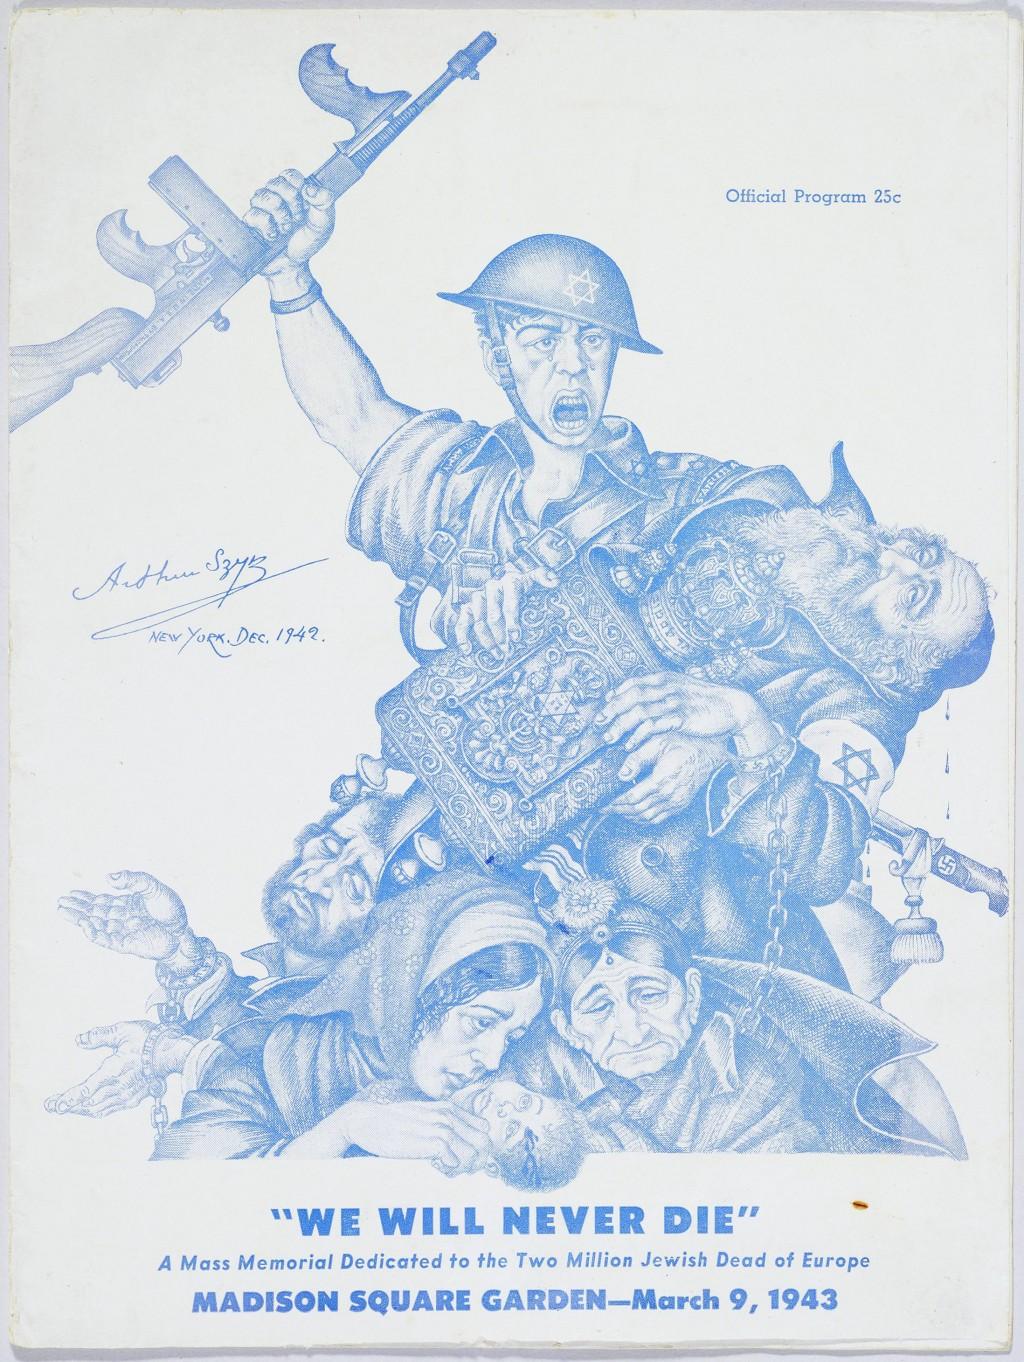 We Will Never Die, program cover, 1943 [LCID: 2005ogbu]